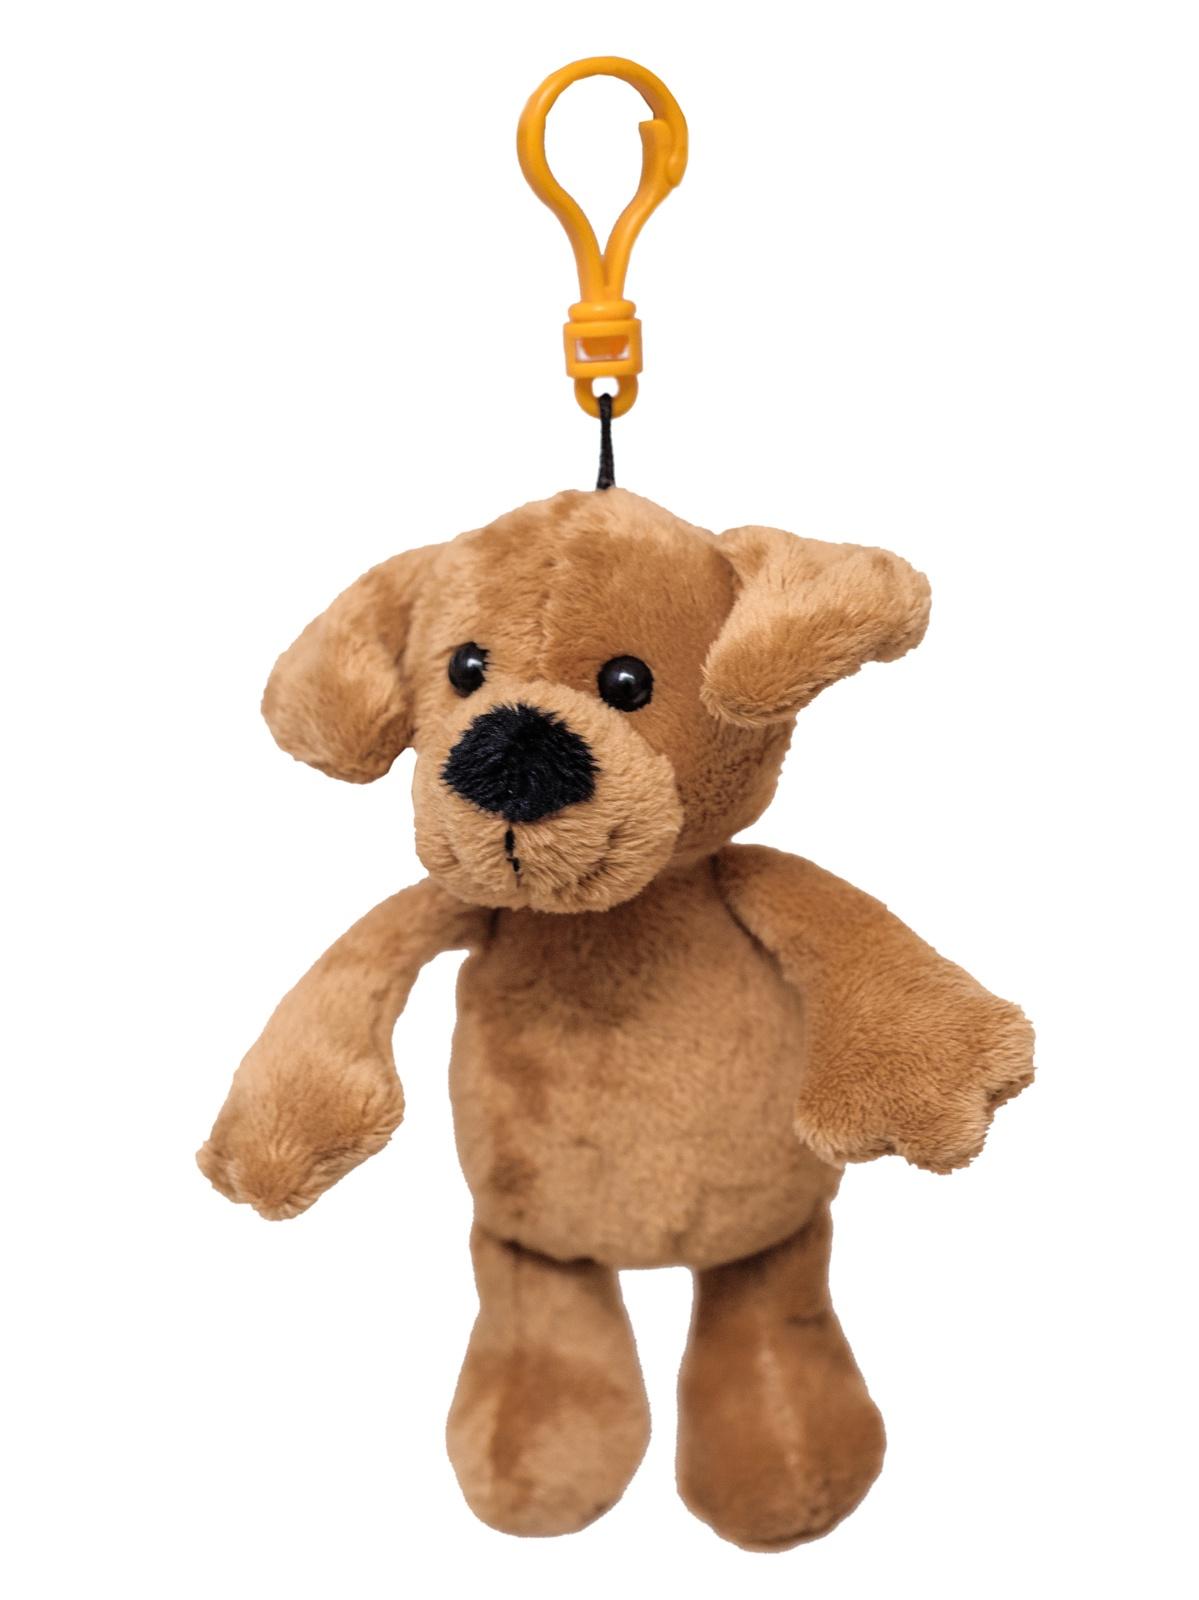 Мягкая игрушка Плюш Ленд брелок Собака из коллекции Mini Zoo бежевый цена